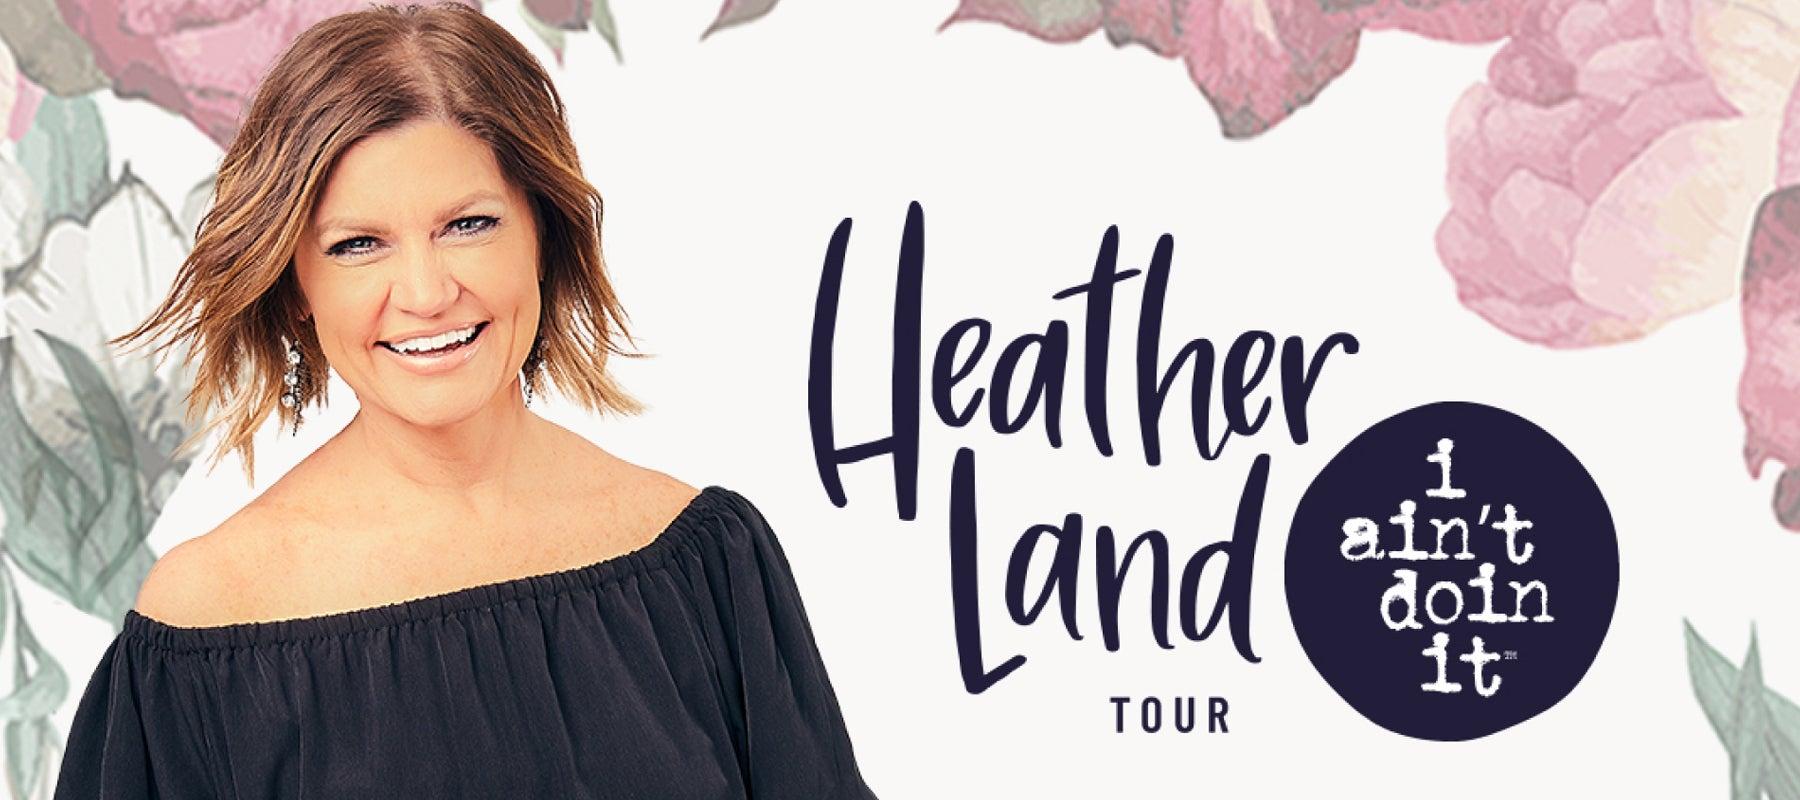 Heather Land i ain't doin it Tour